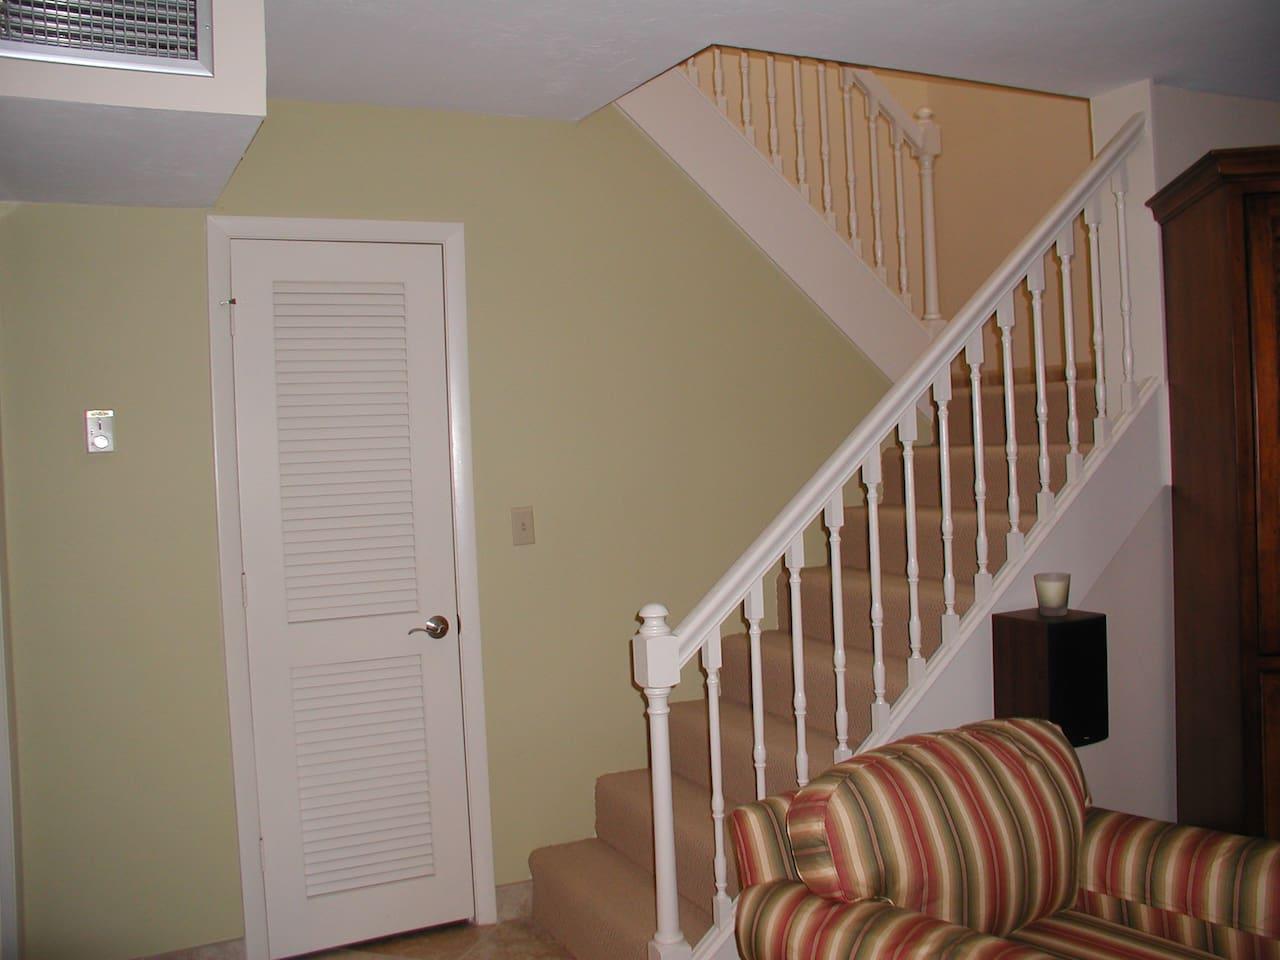 2 story~skylight at stairway